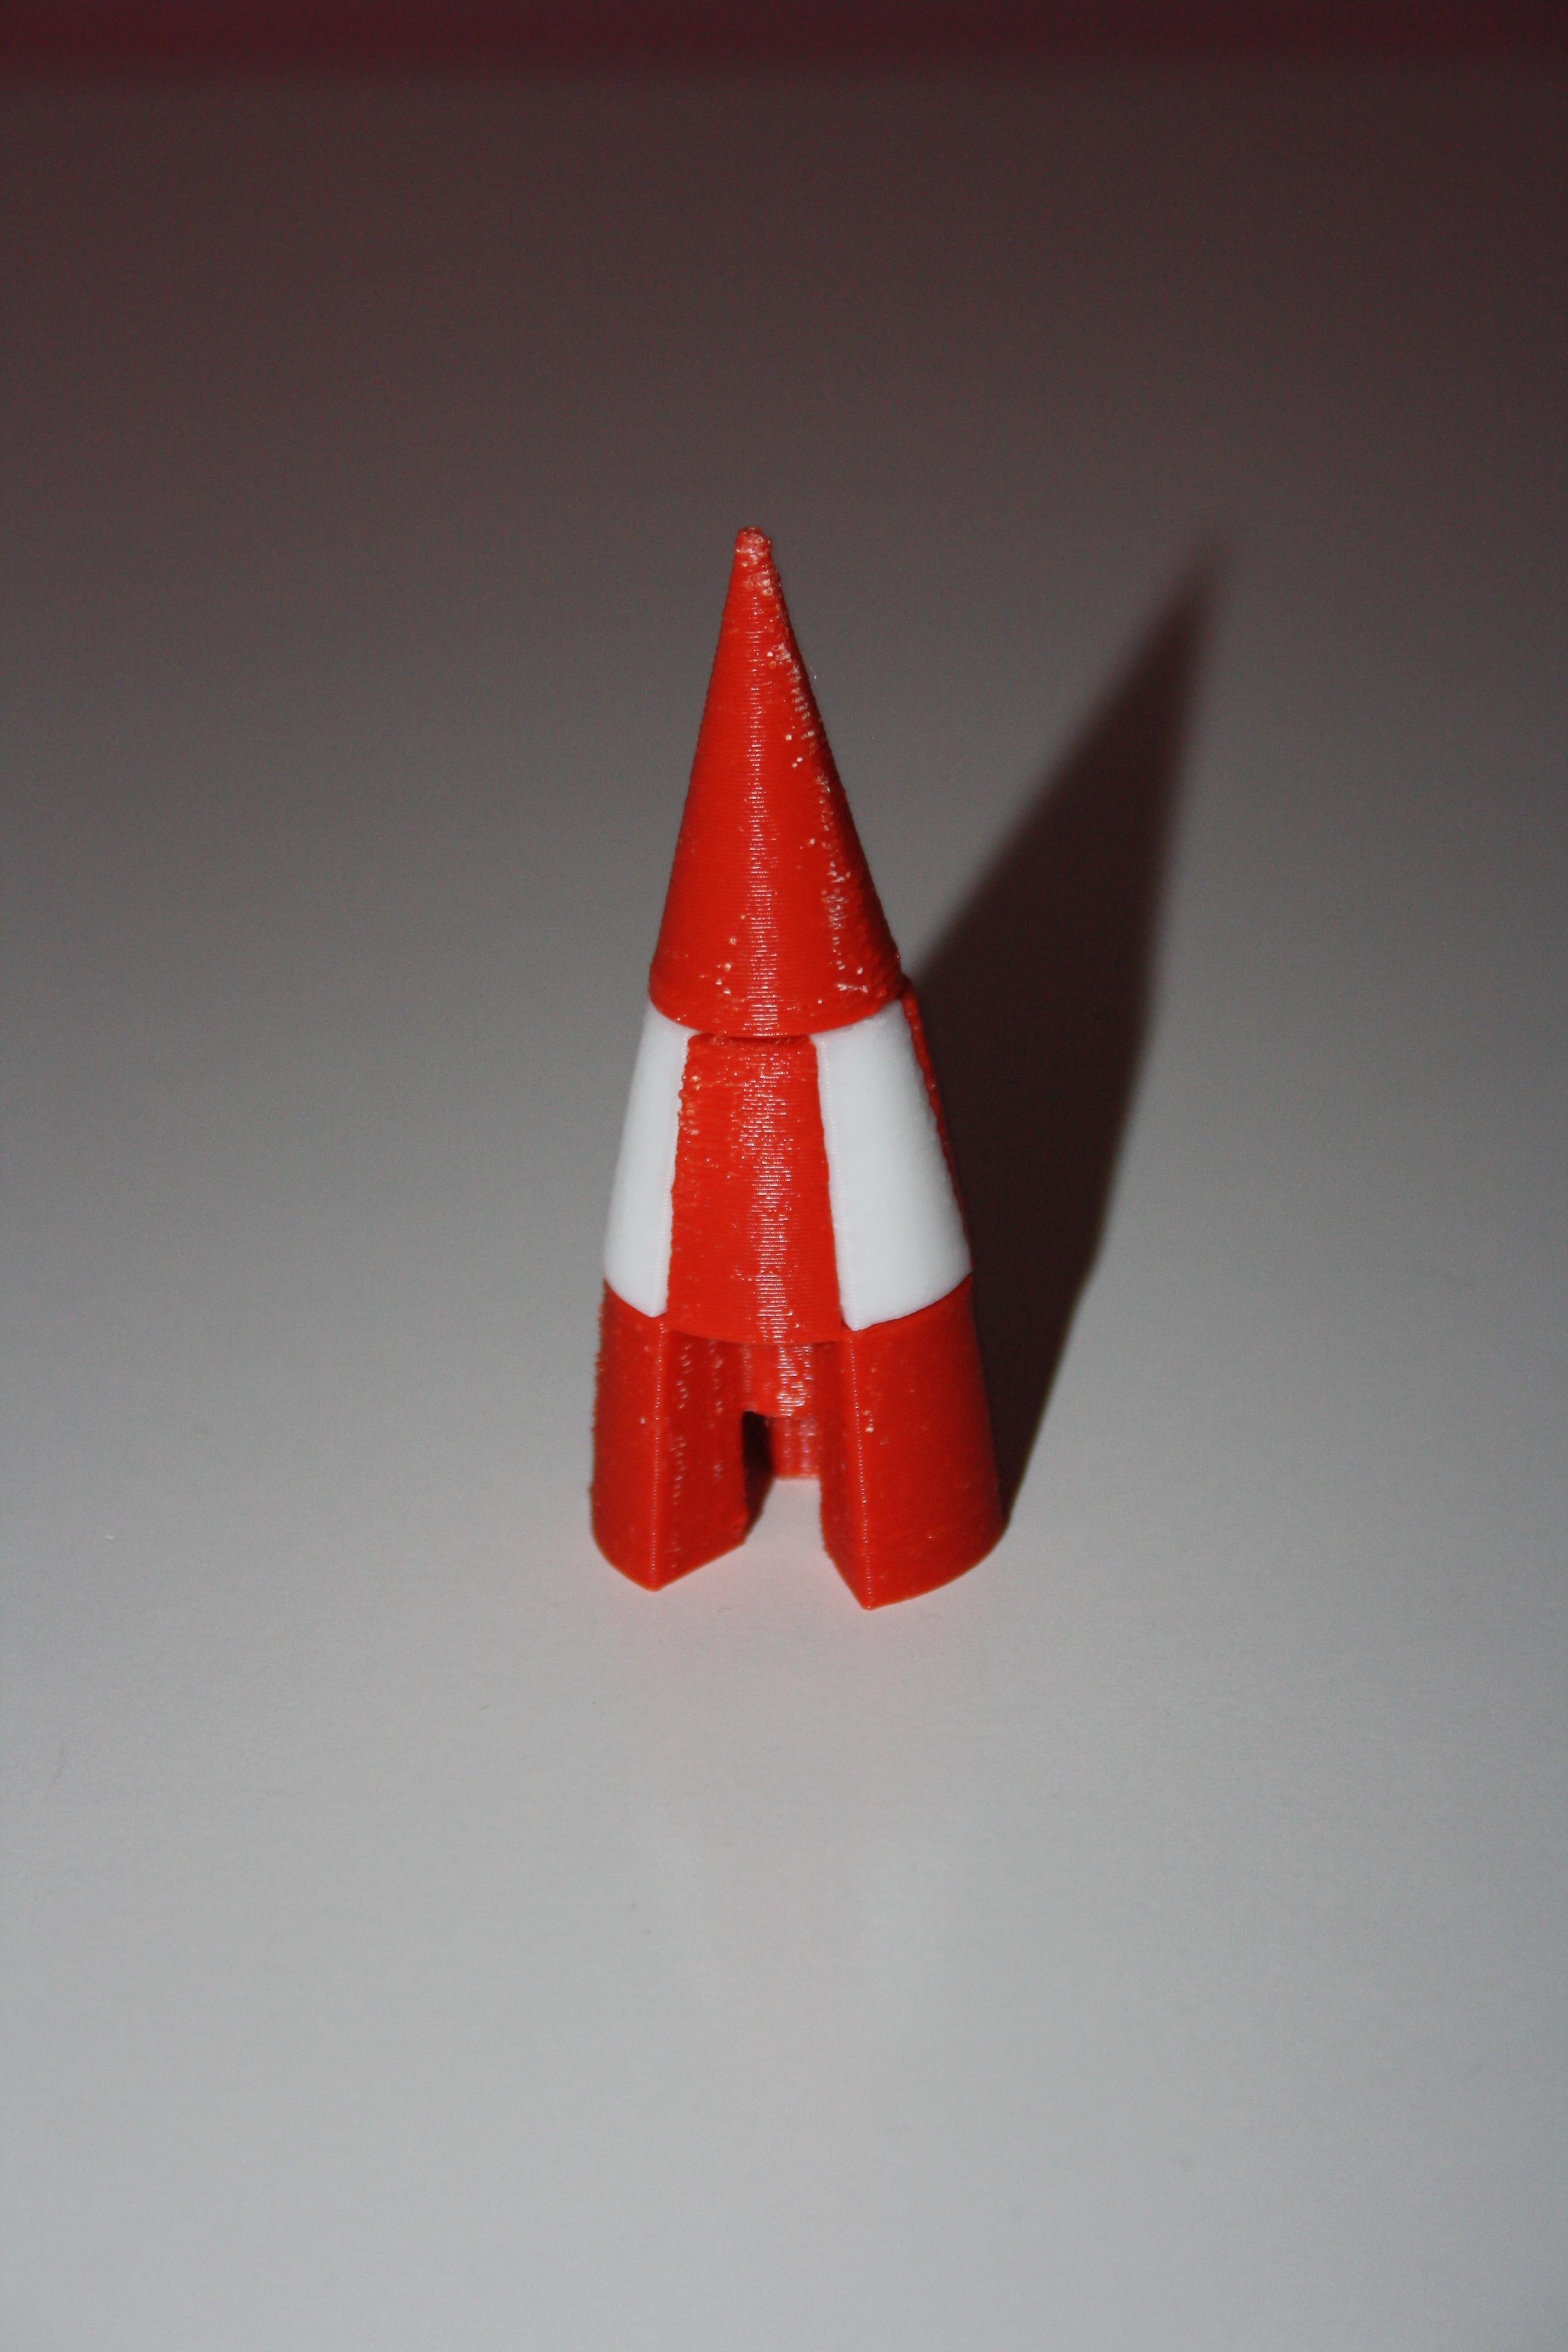 Fusee_Tintin_009.JPG Download free STL file Tintin Rocket • 3D printable object, JJB